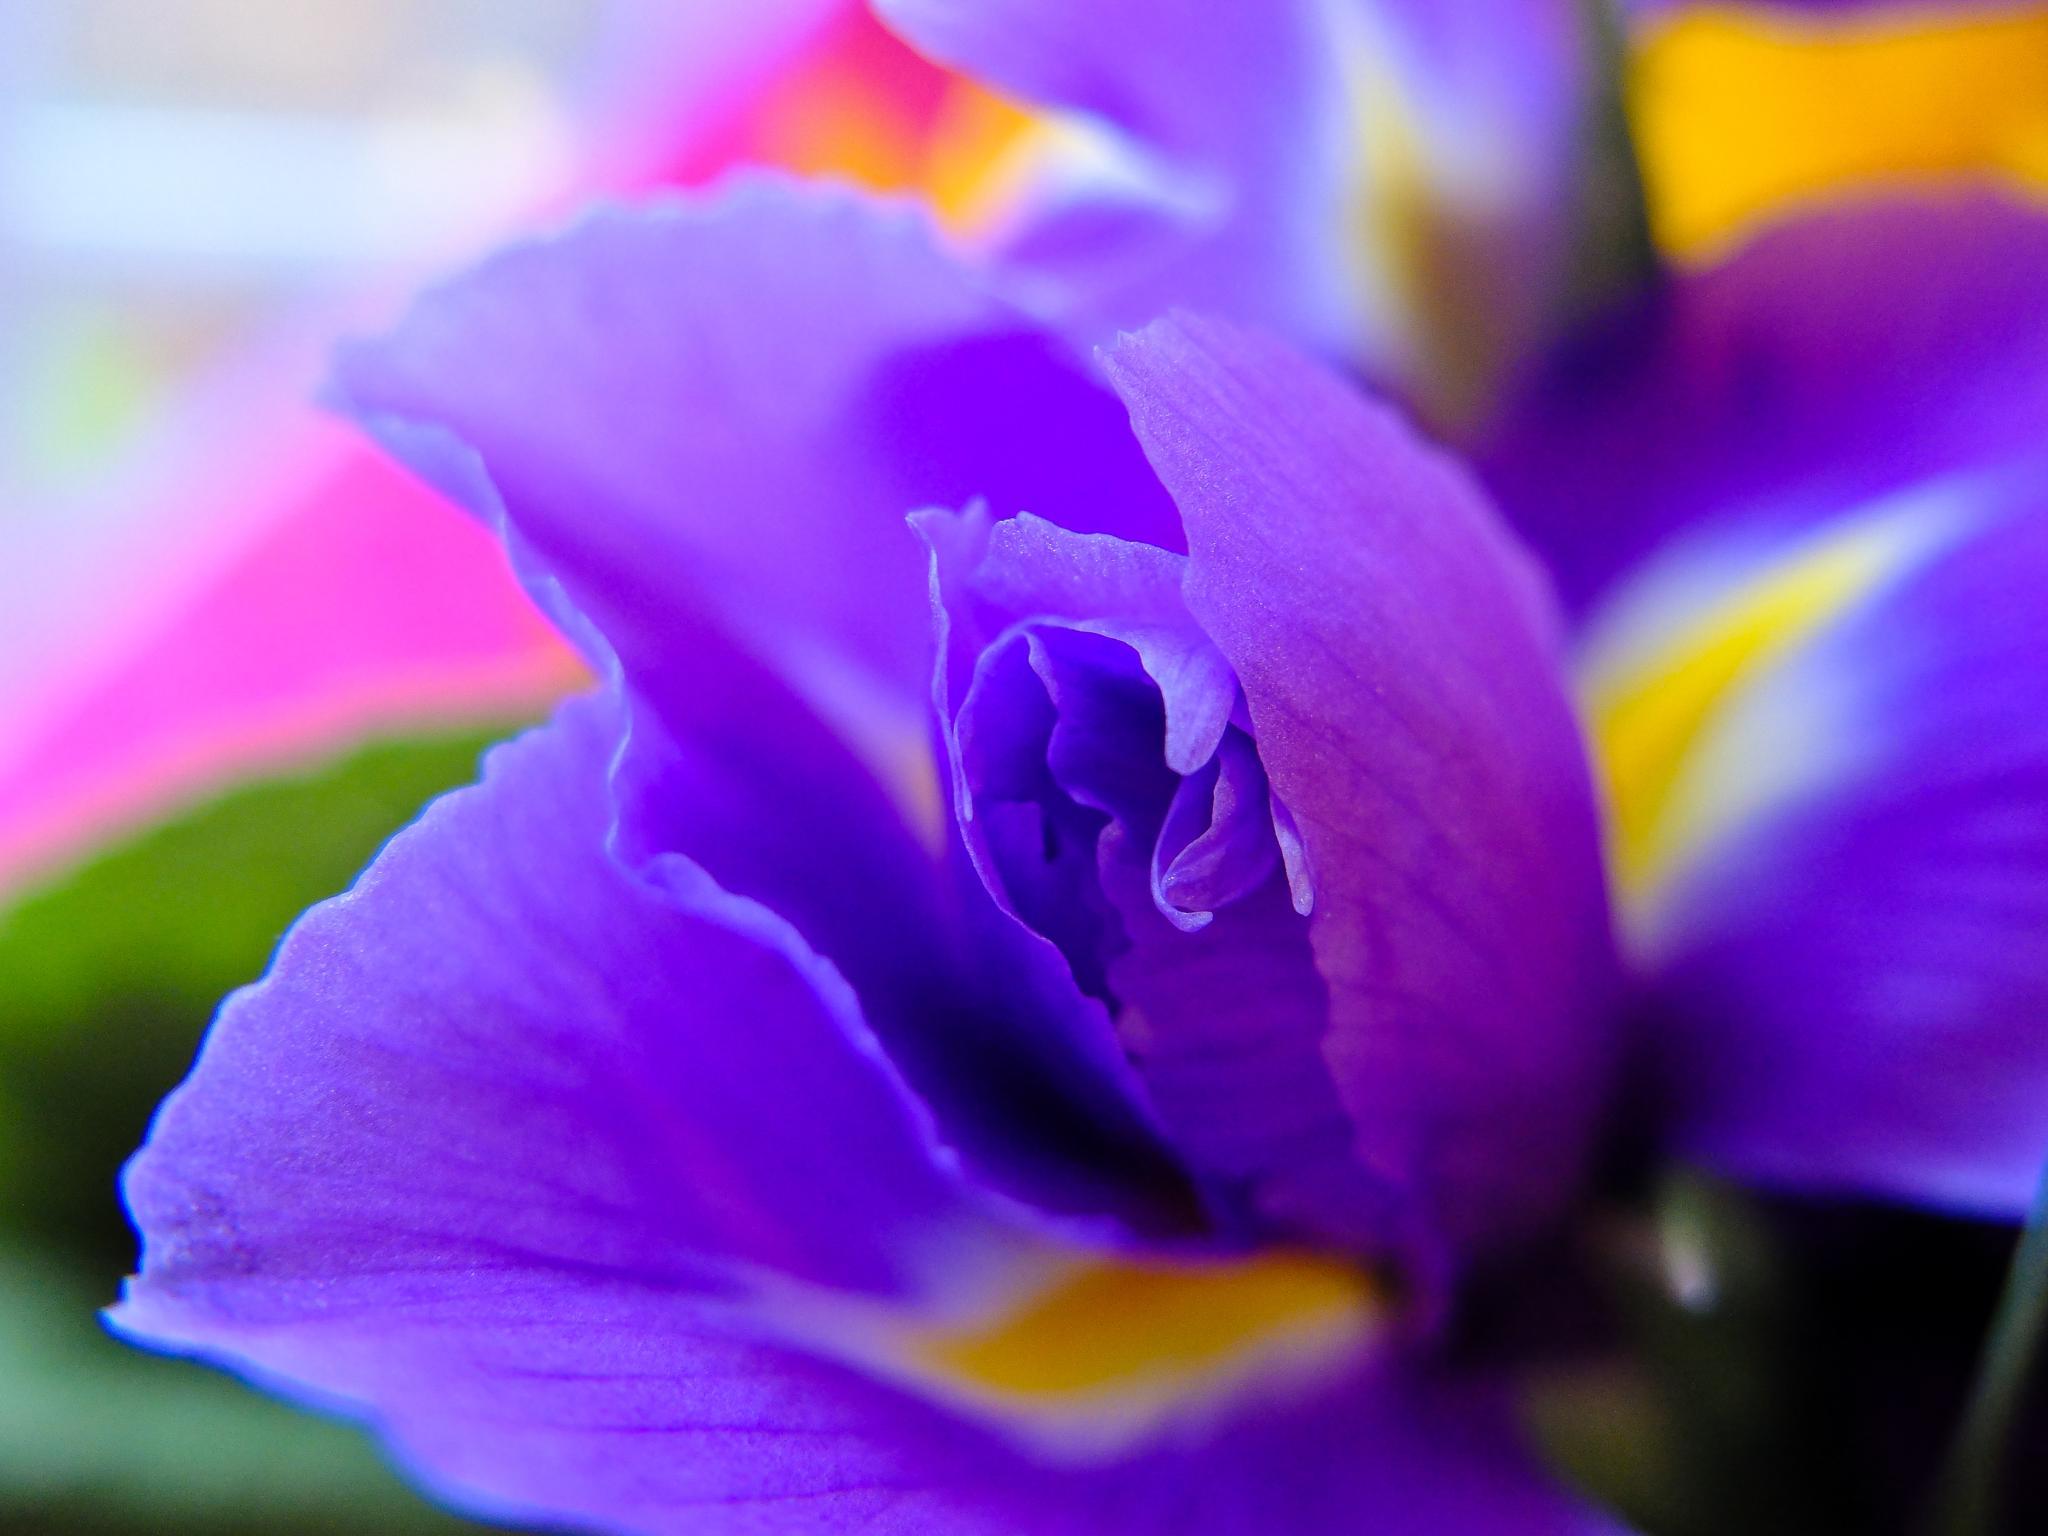 Flower by Adam Higgitt